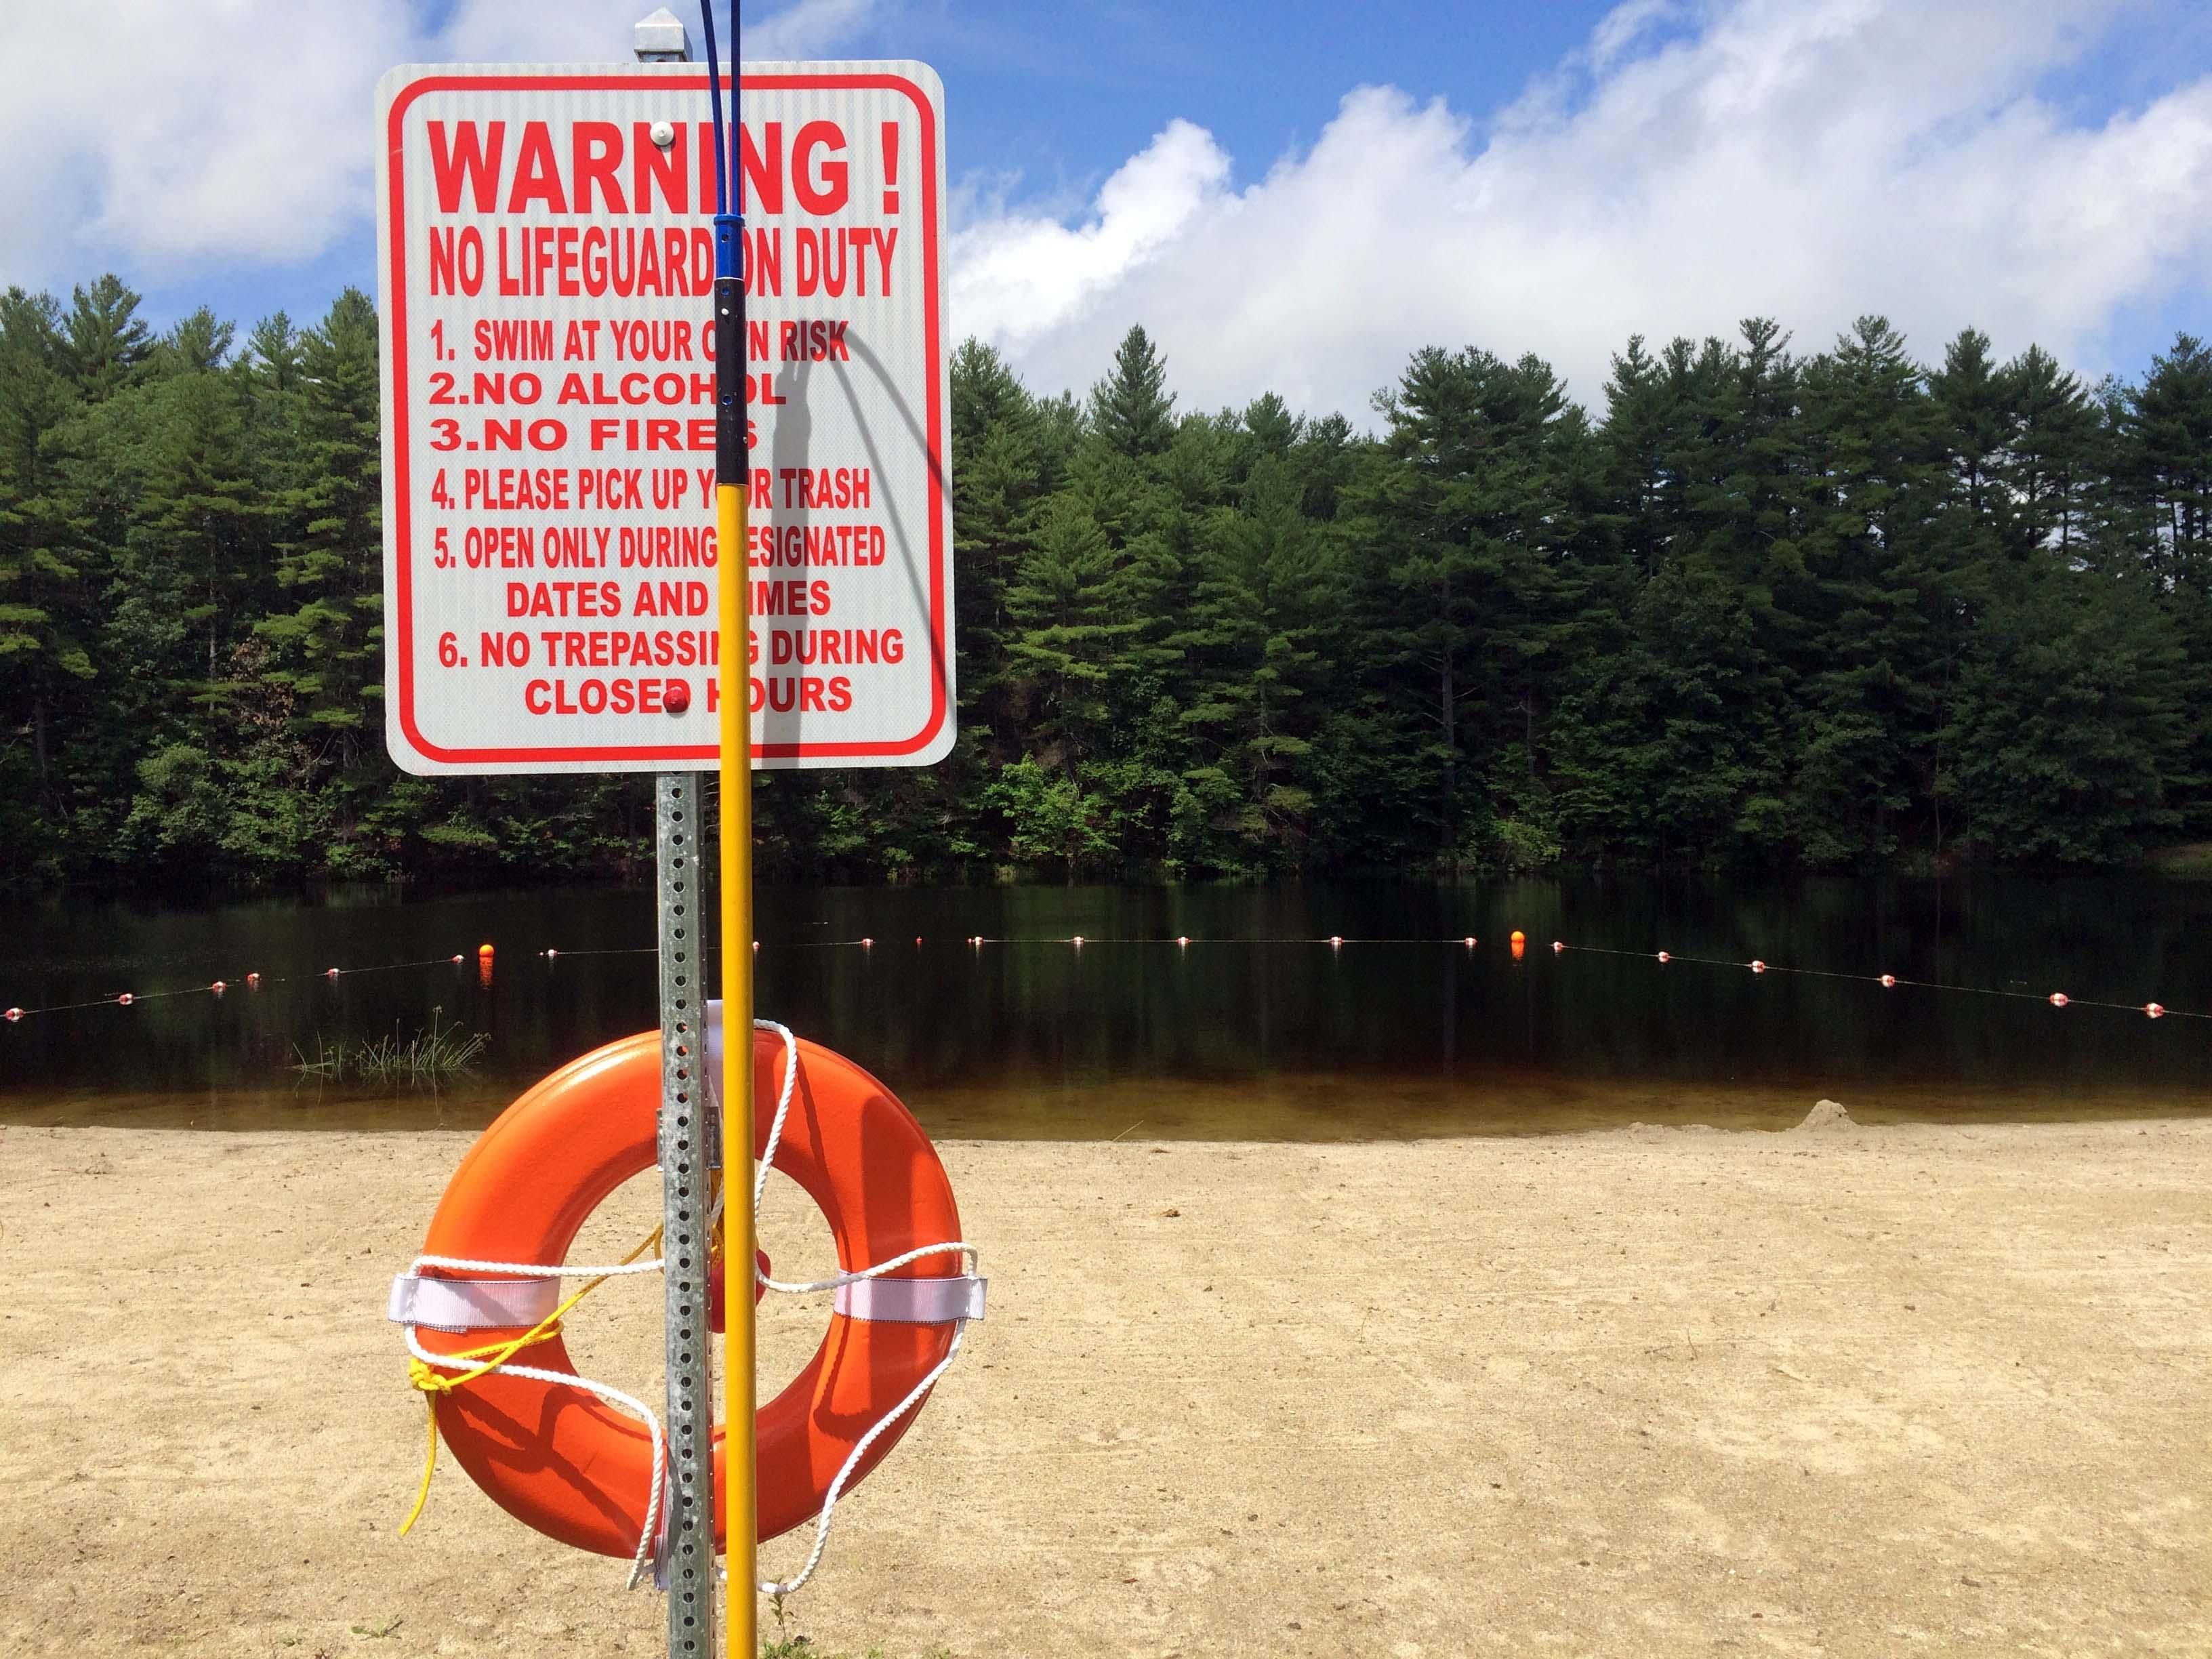 No upgrades planned for killinglys hygeia reservoir